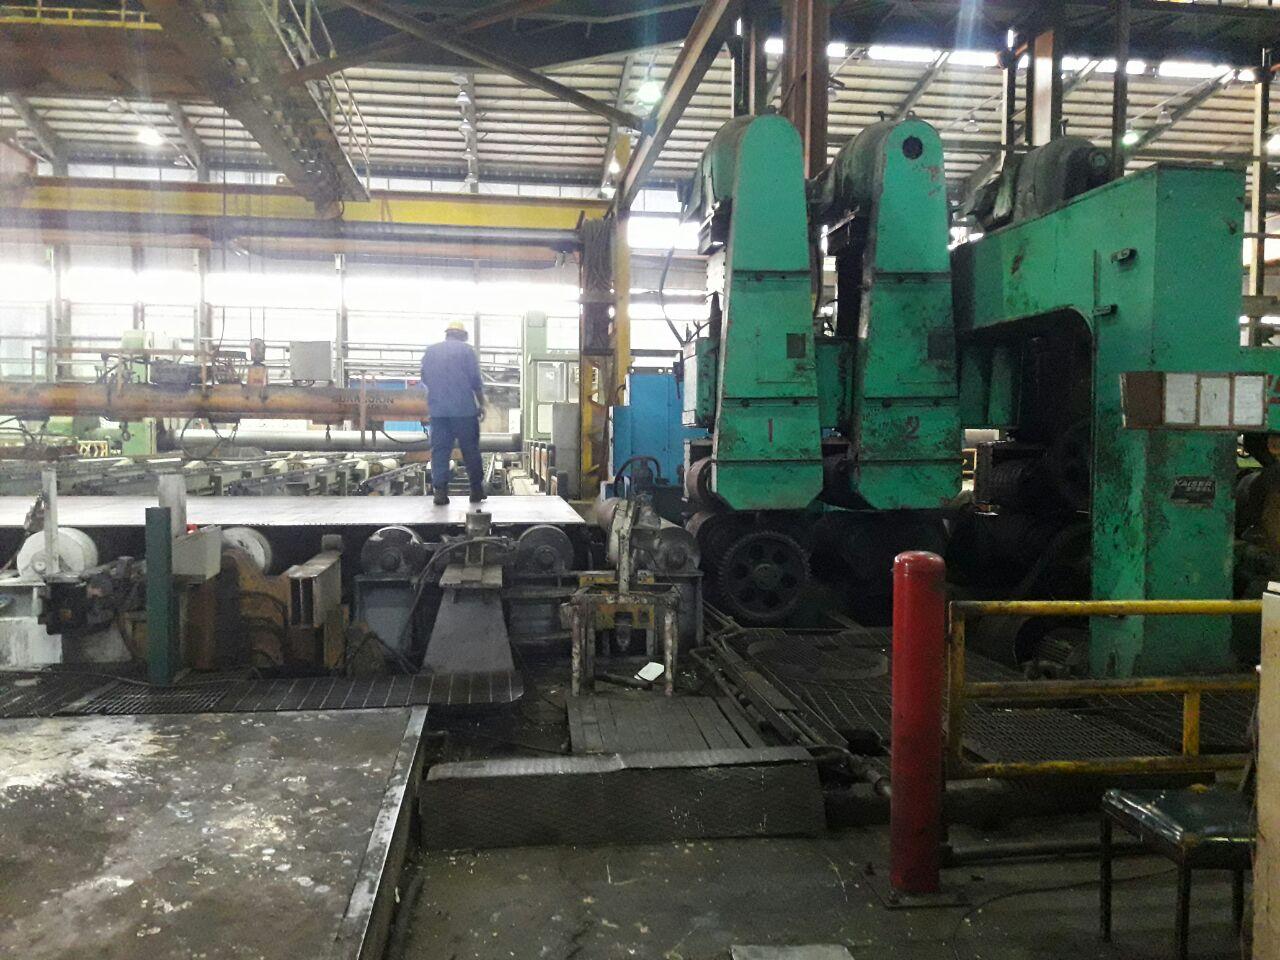 IMG 20200502 063806 925 شرکت لولهسازی اهواز در سال جهش تولید ظرفیت همکاری با صنایع را افزایش داد